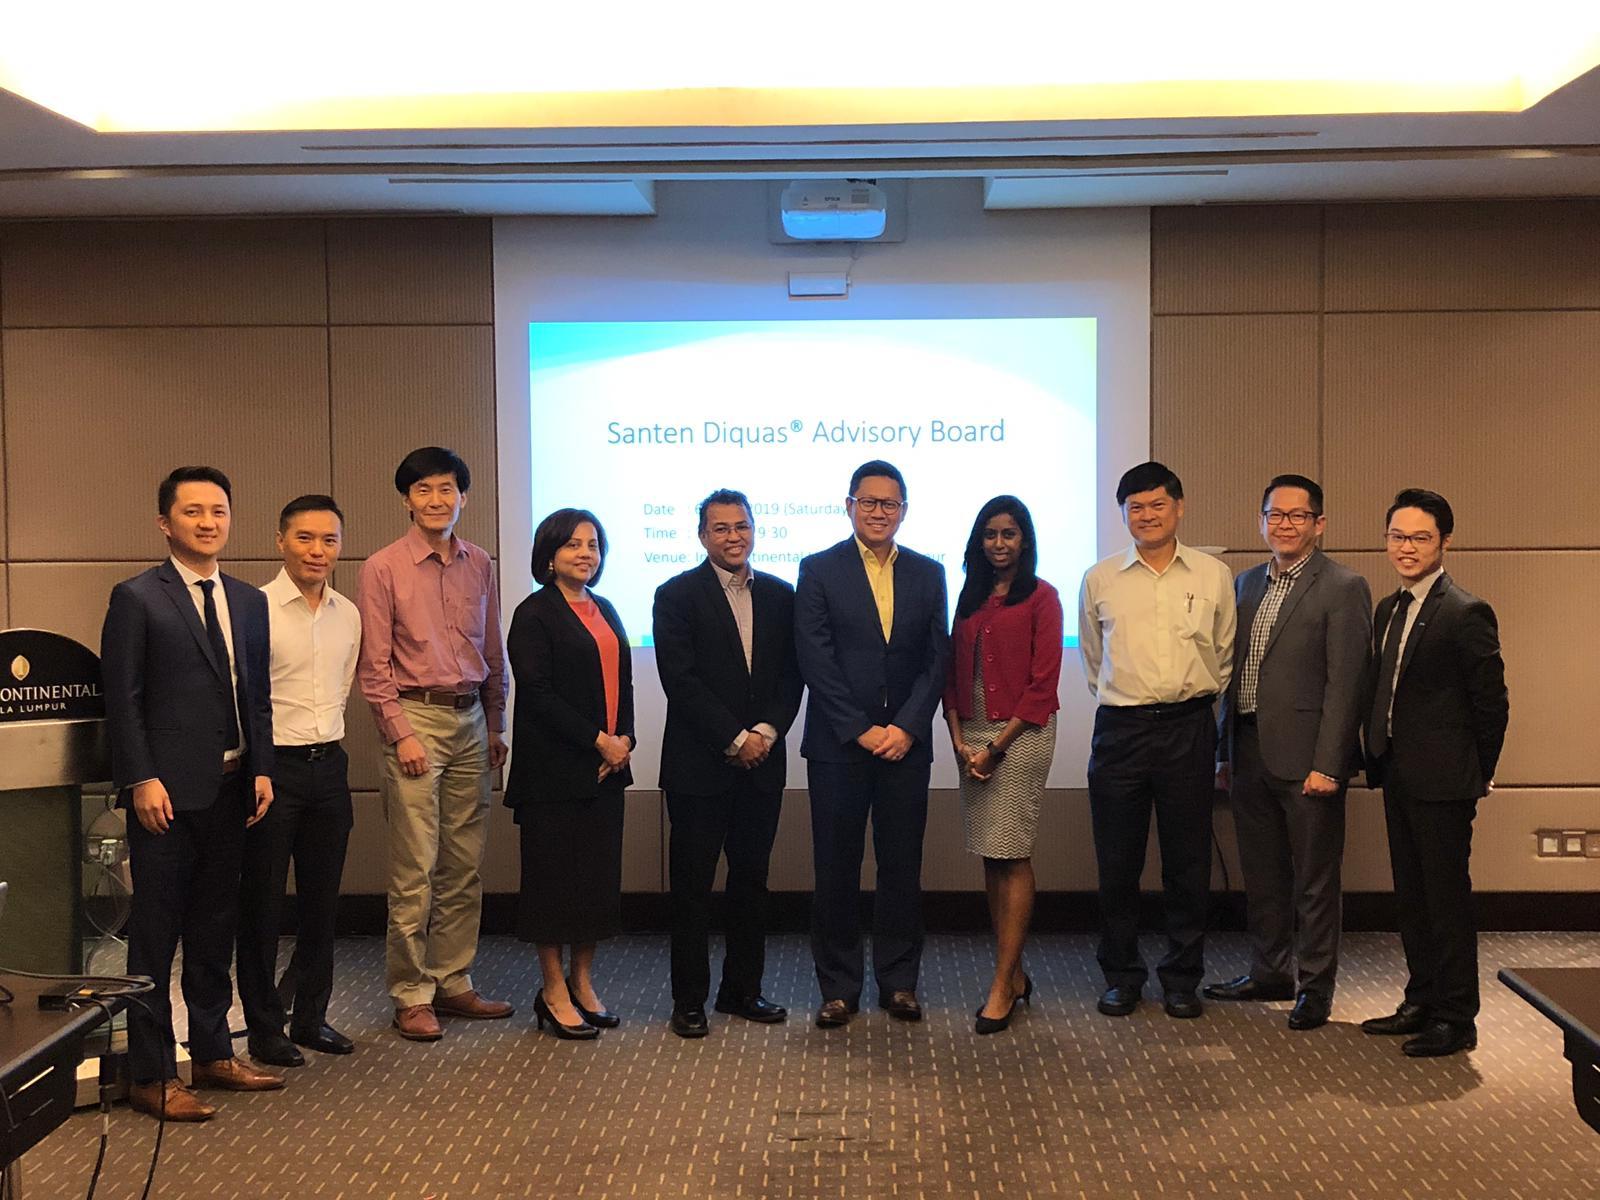 Dr Lim San Ten KL Talk Group